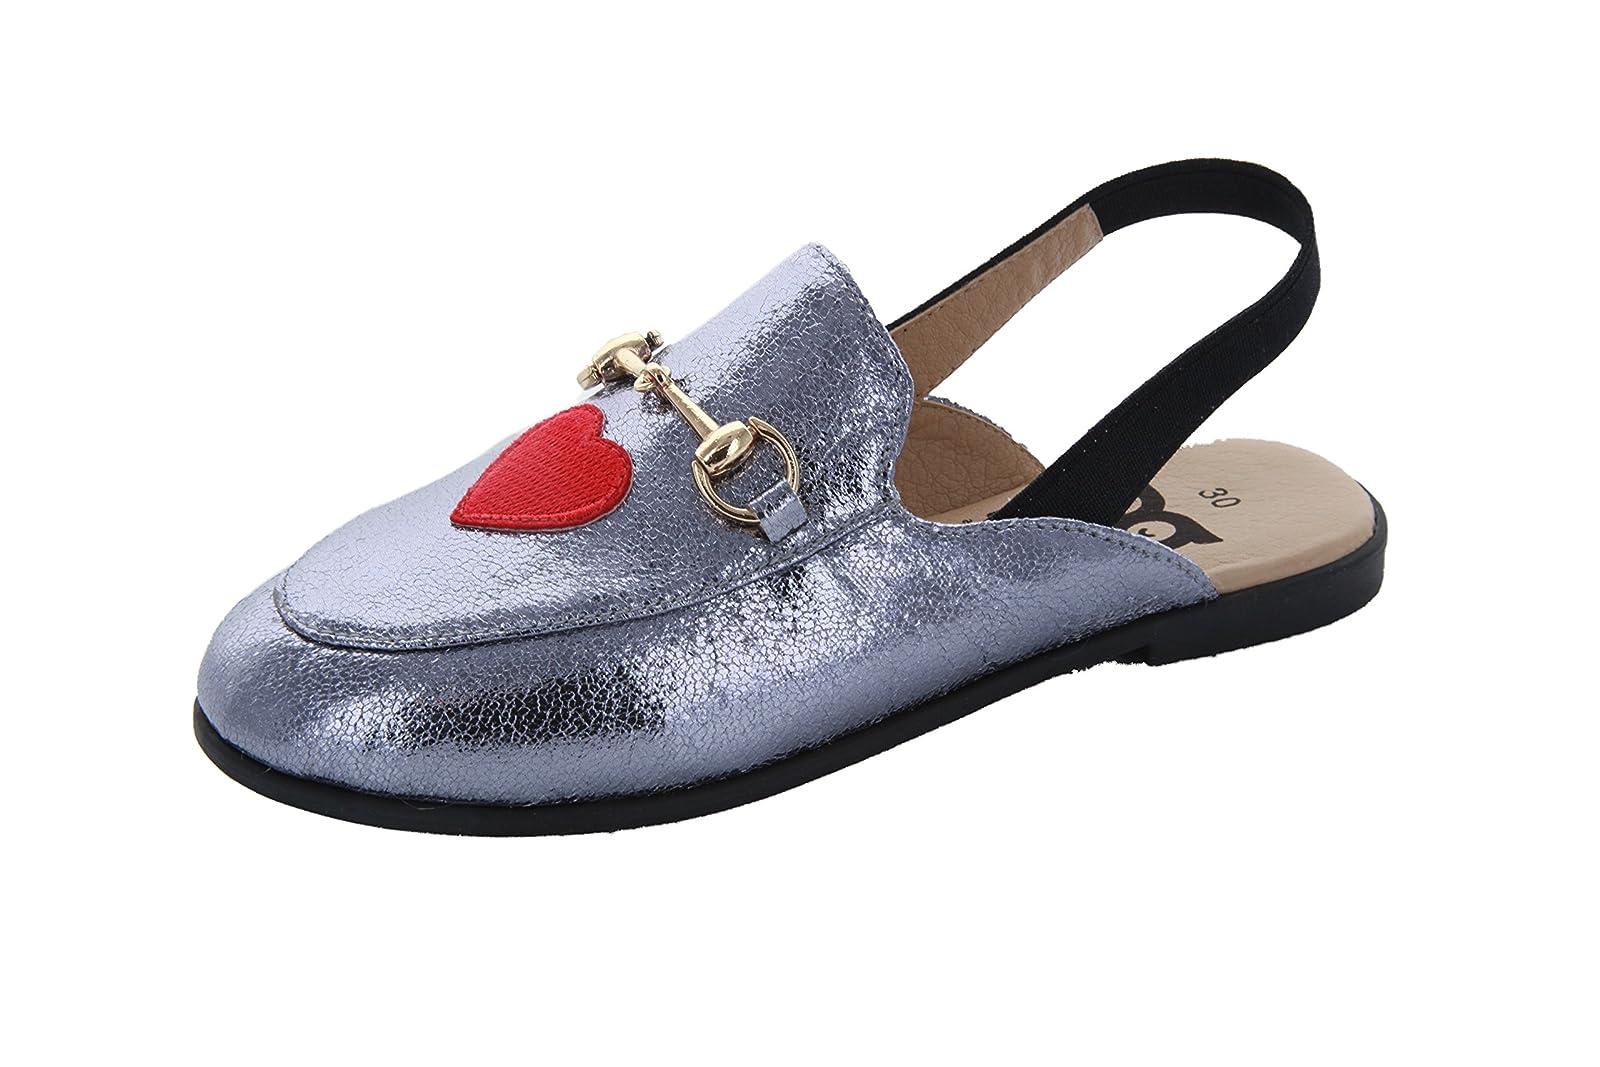 Hoo Shoes - Girls Mule/Slide - Metallic - Fashion - 2